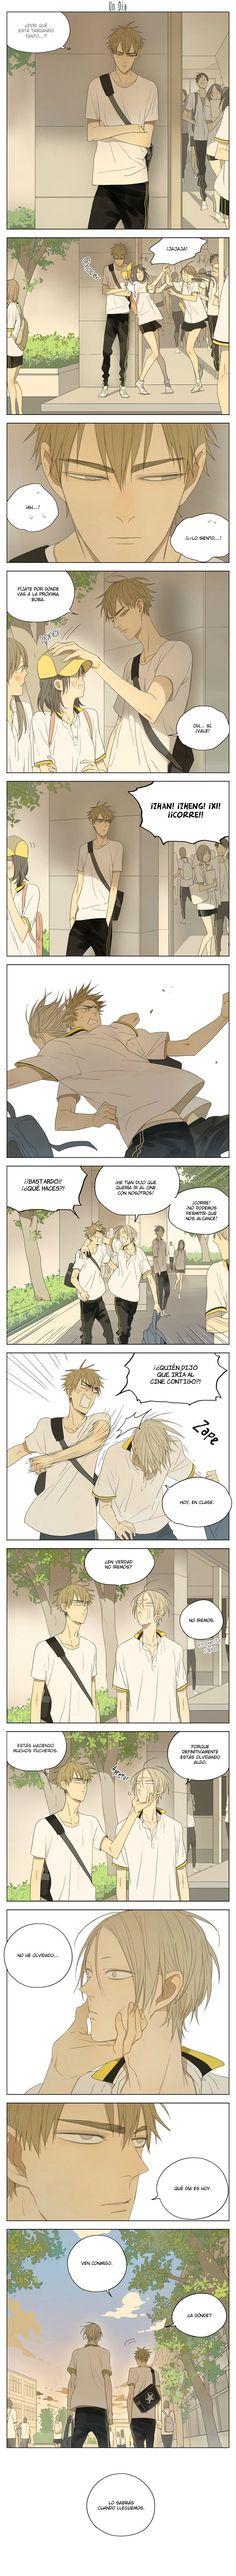 19 Days Capítulo 6 página 2 (Cargar imágenes: 3) - Leer Manga en Español gratis en NineManga.com